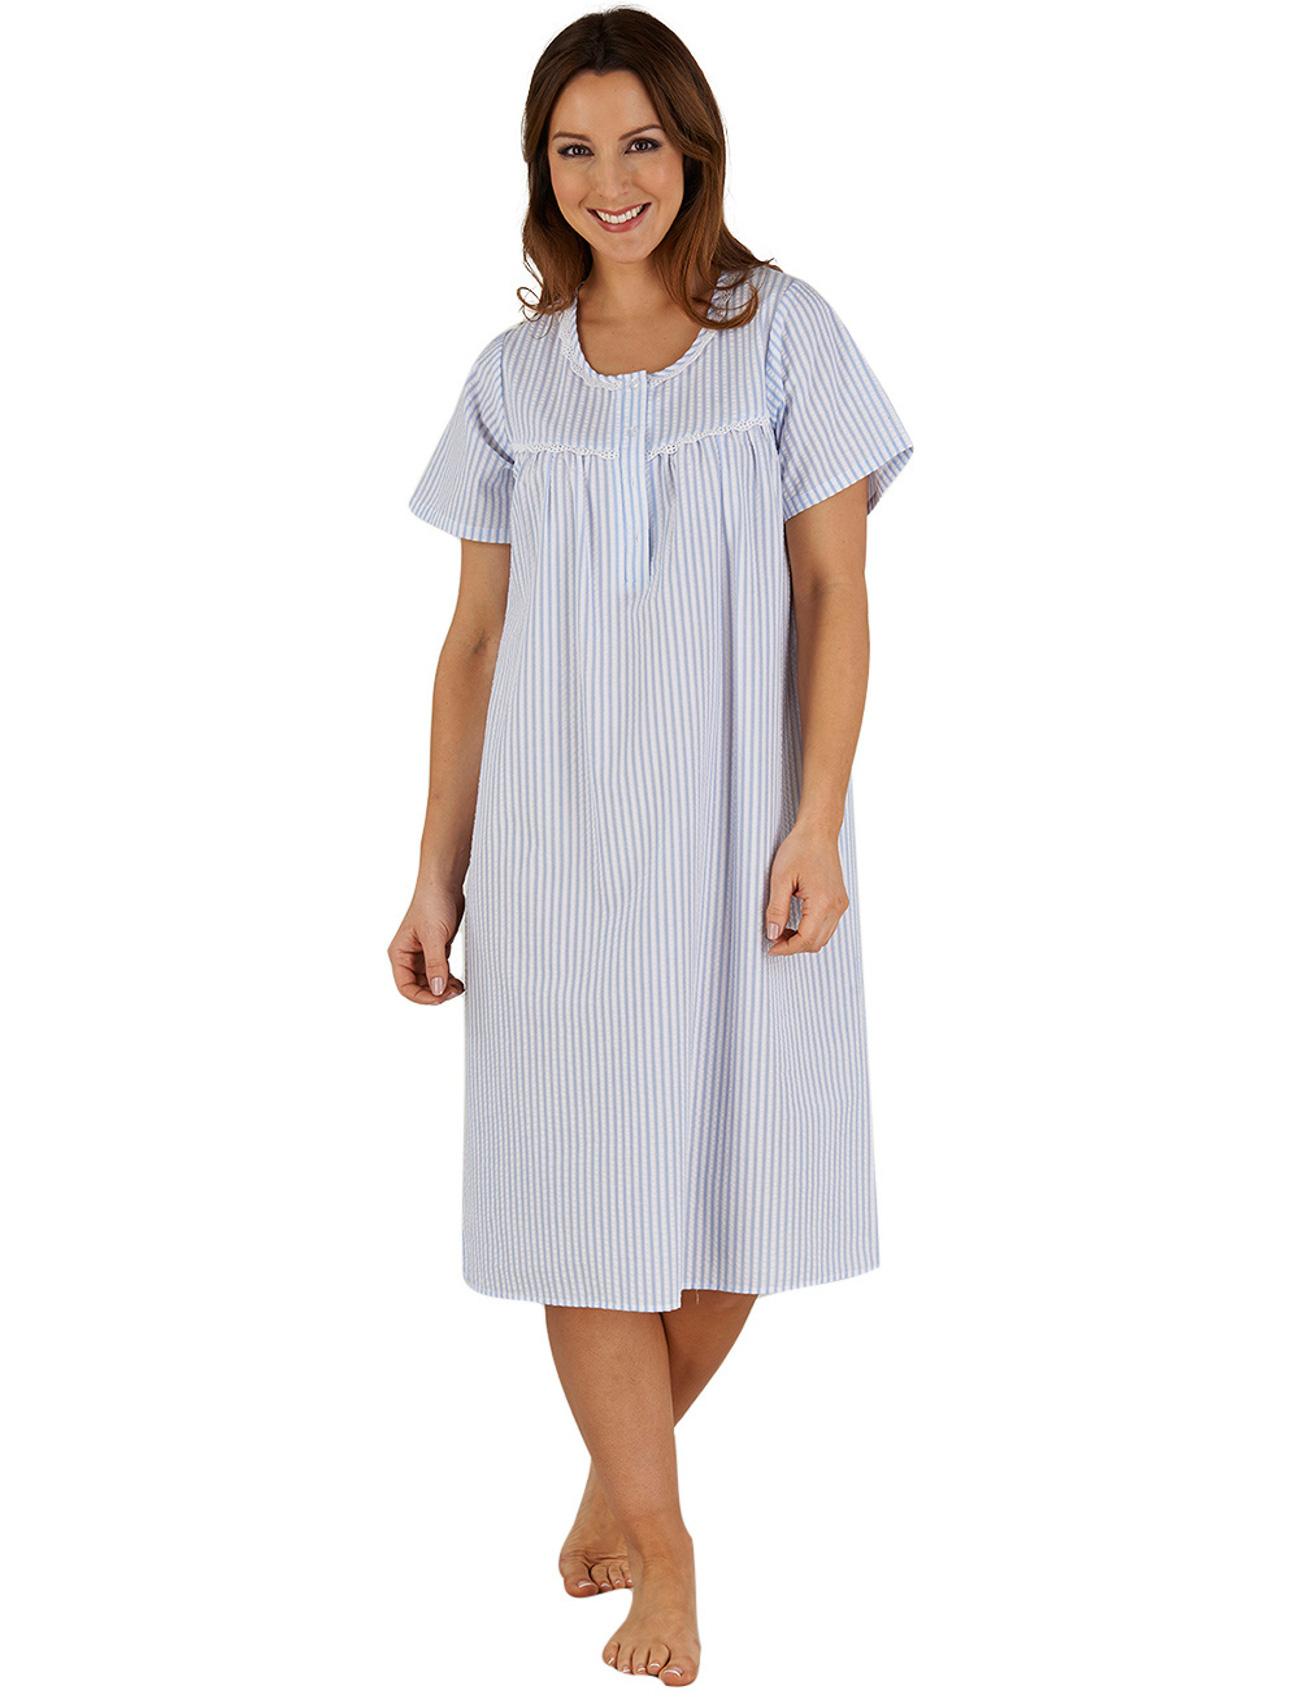 Womens Night Dress Seersucker Stripe Short Sleeve Slenderella Lace Trim  Nighty 89a9247d8